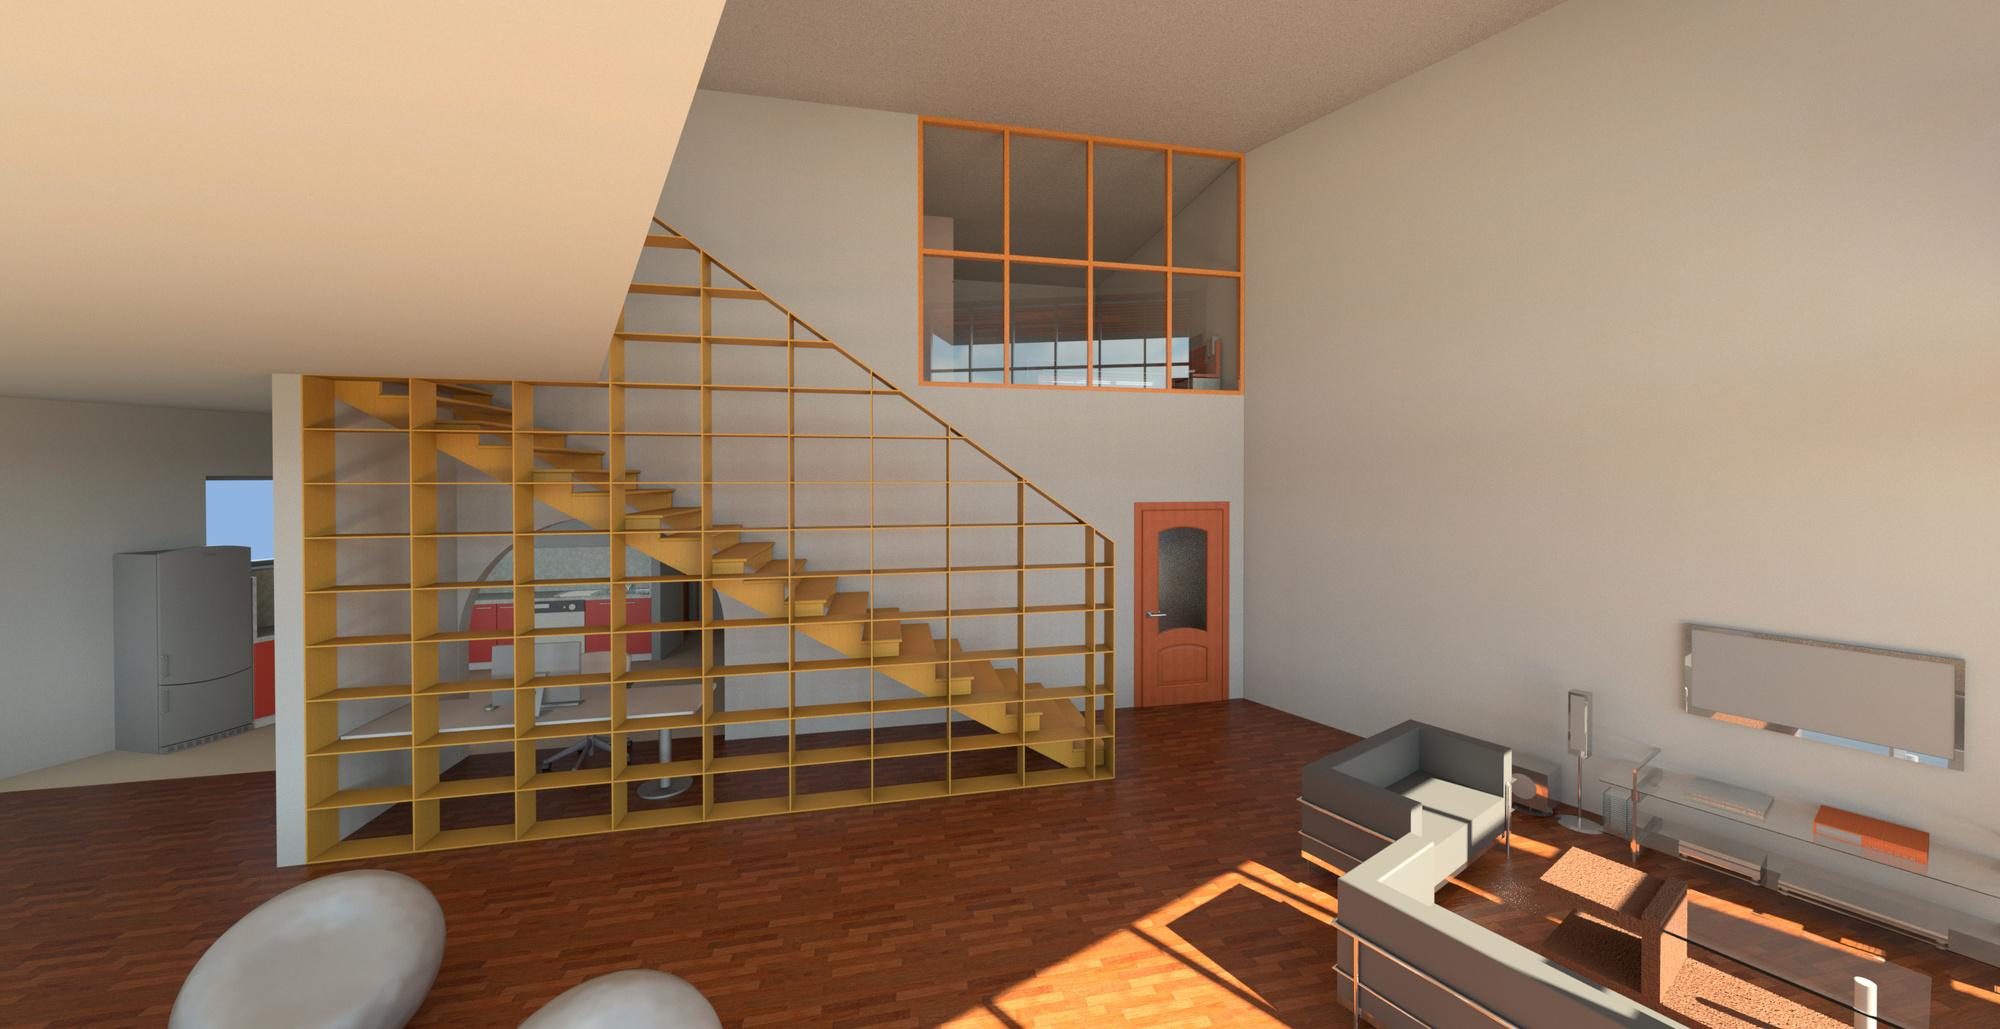 Raas-rendering20150604-11991-18qjswo